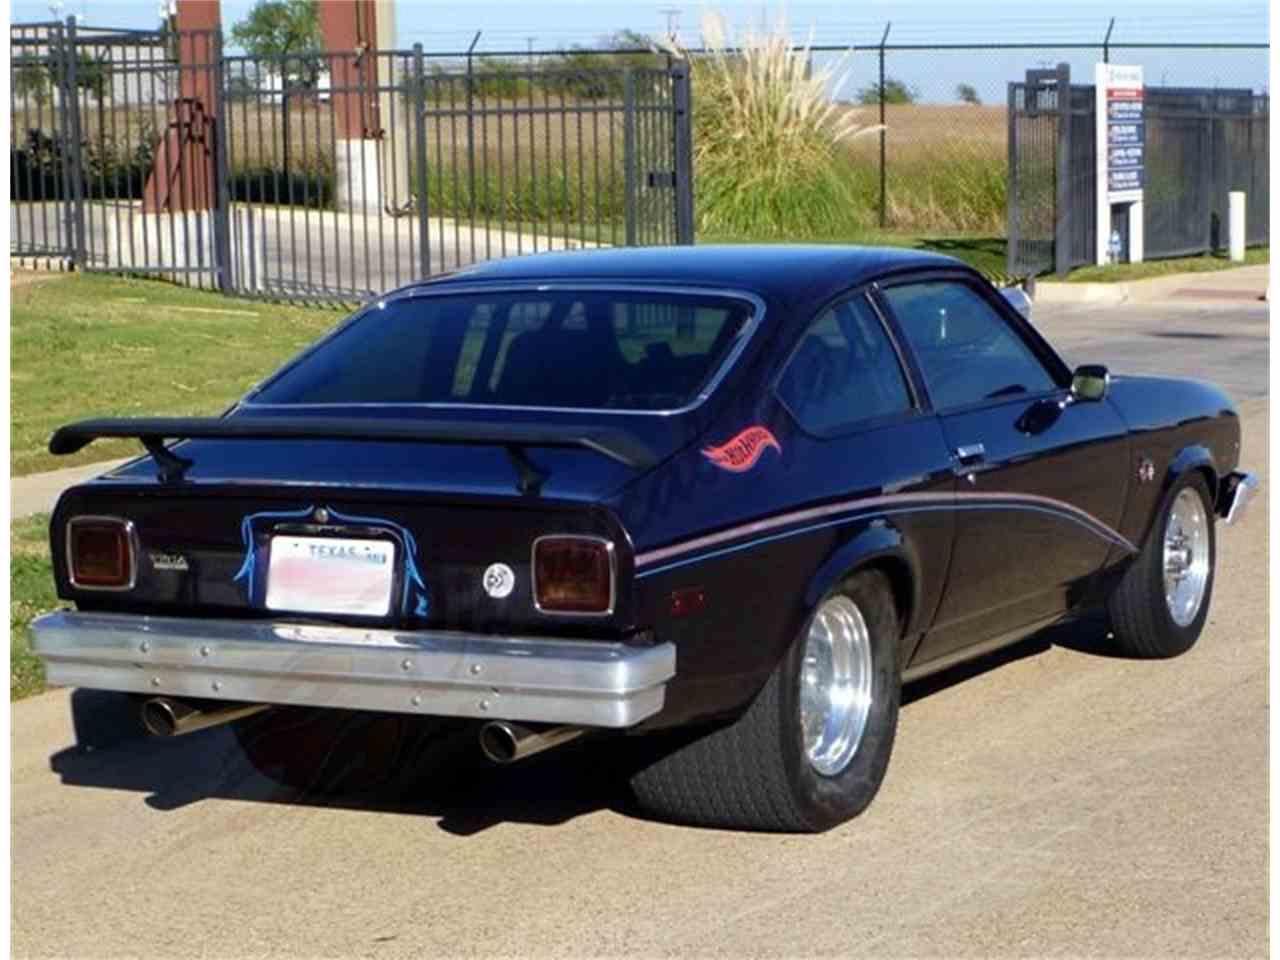 1974 Datsun 620 Wiring Diagram Schematic Diagrams 521 73 Trusted